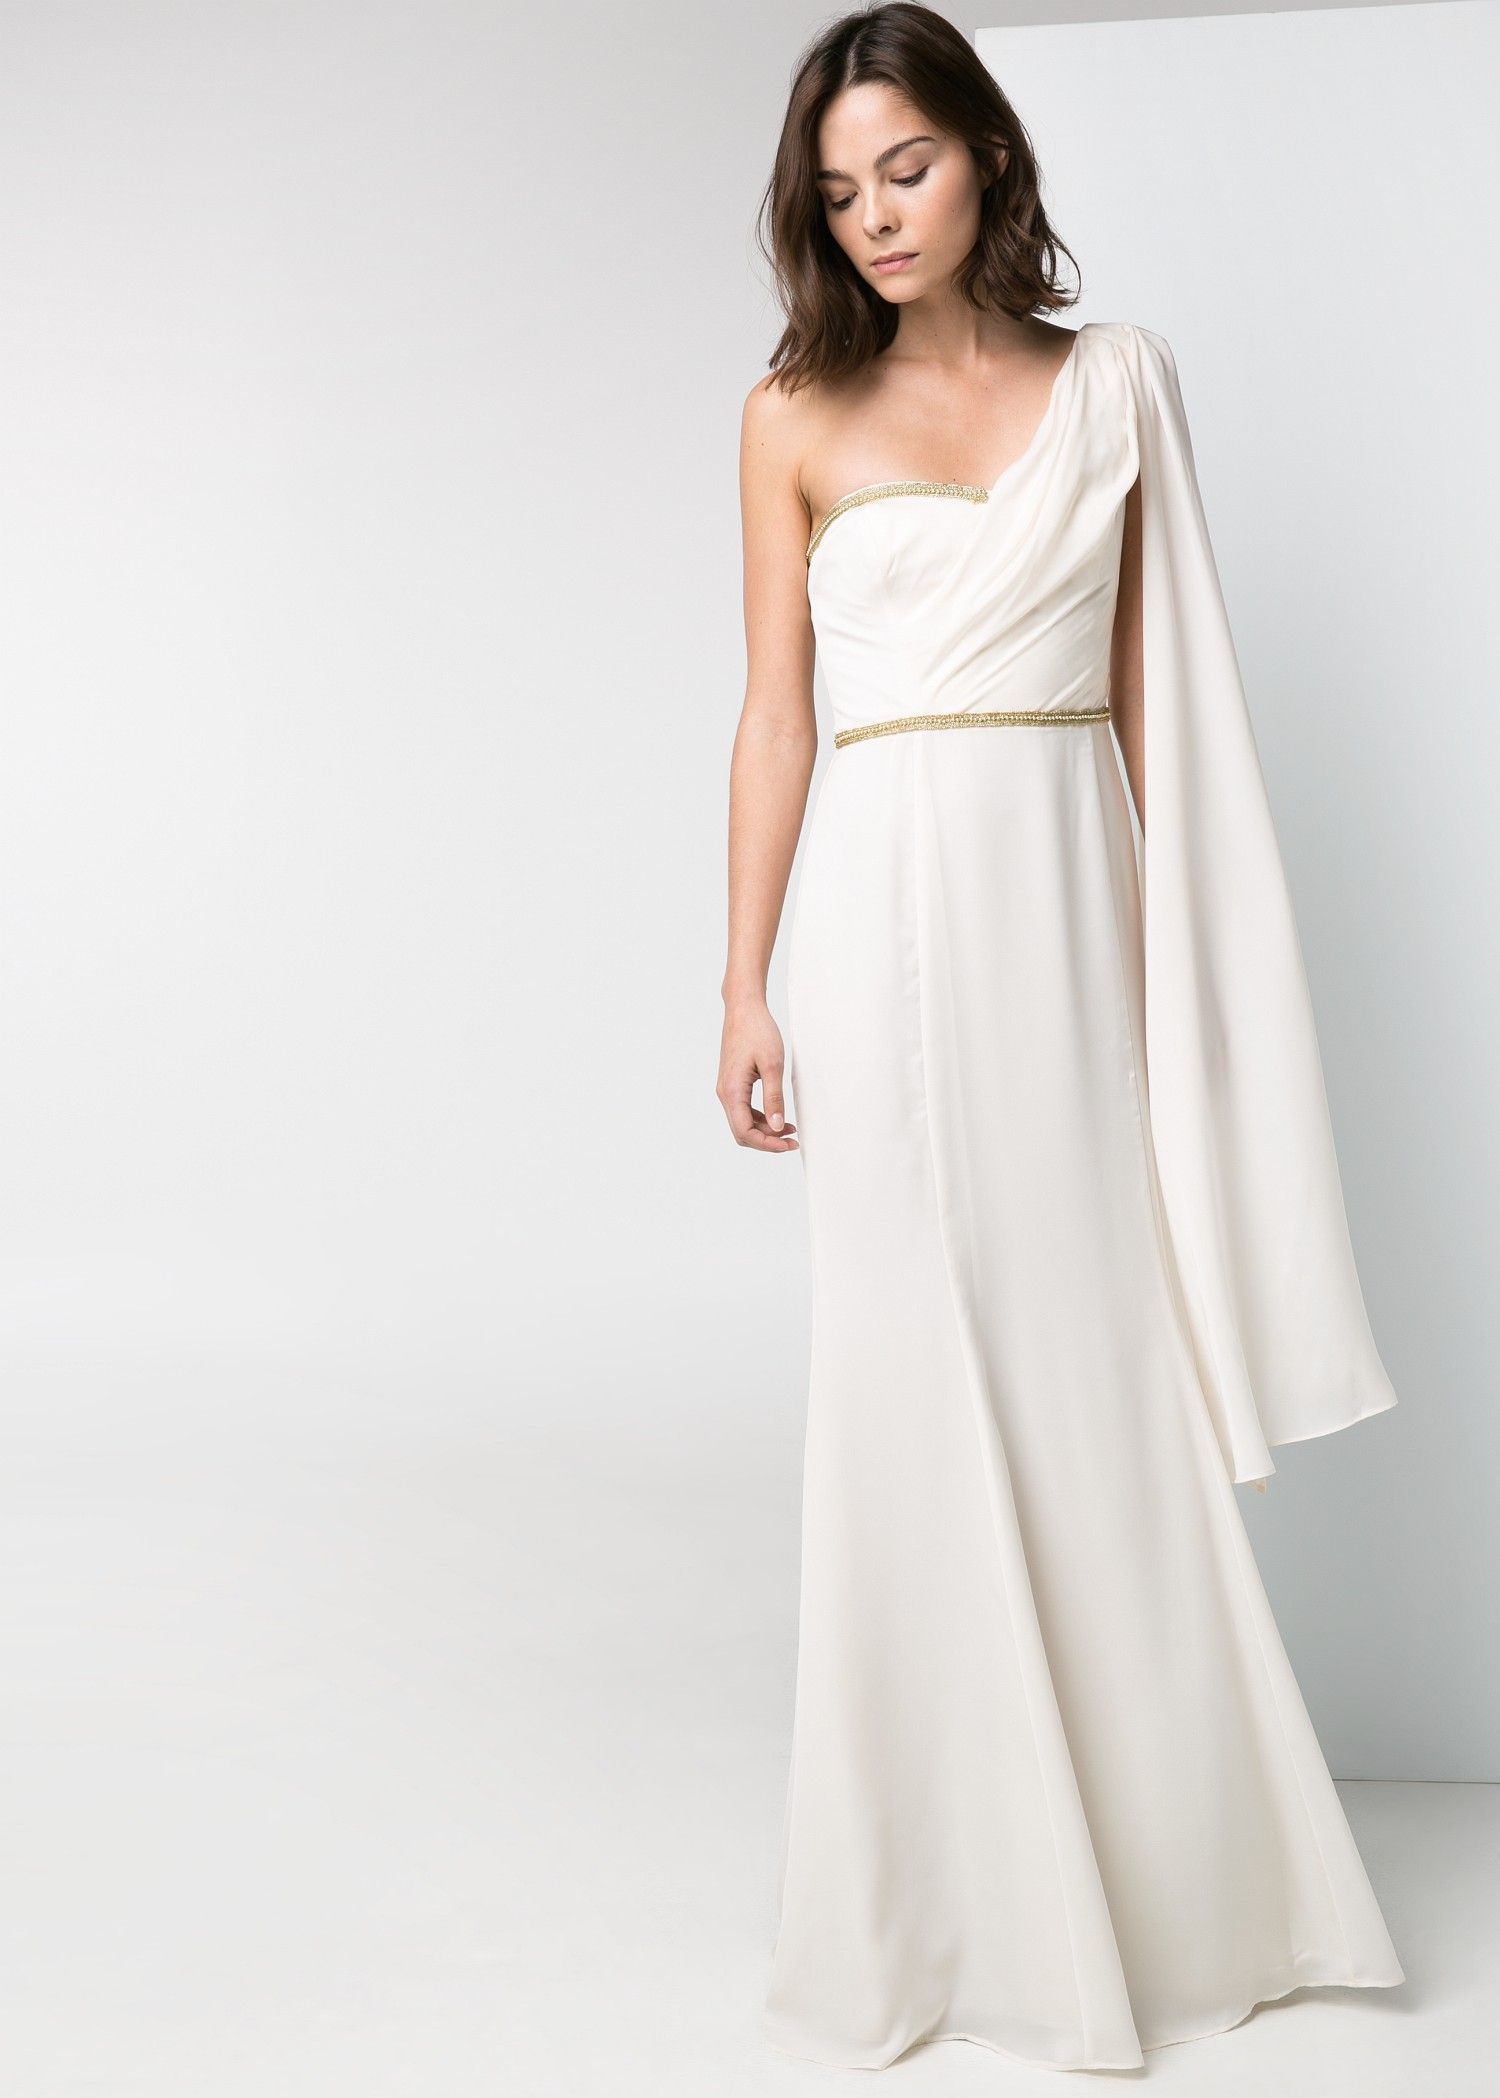 Mango long dresses best dress ideas pinterest